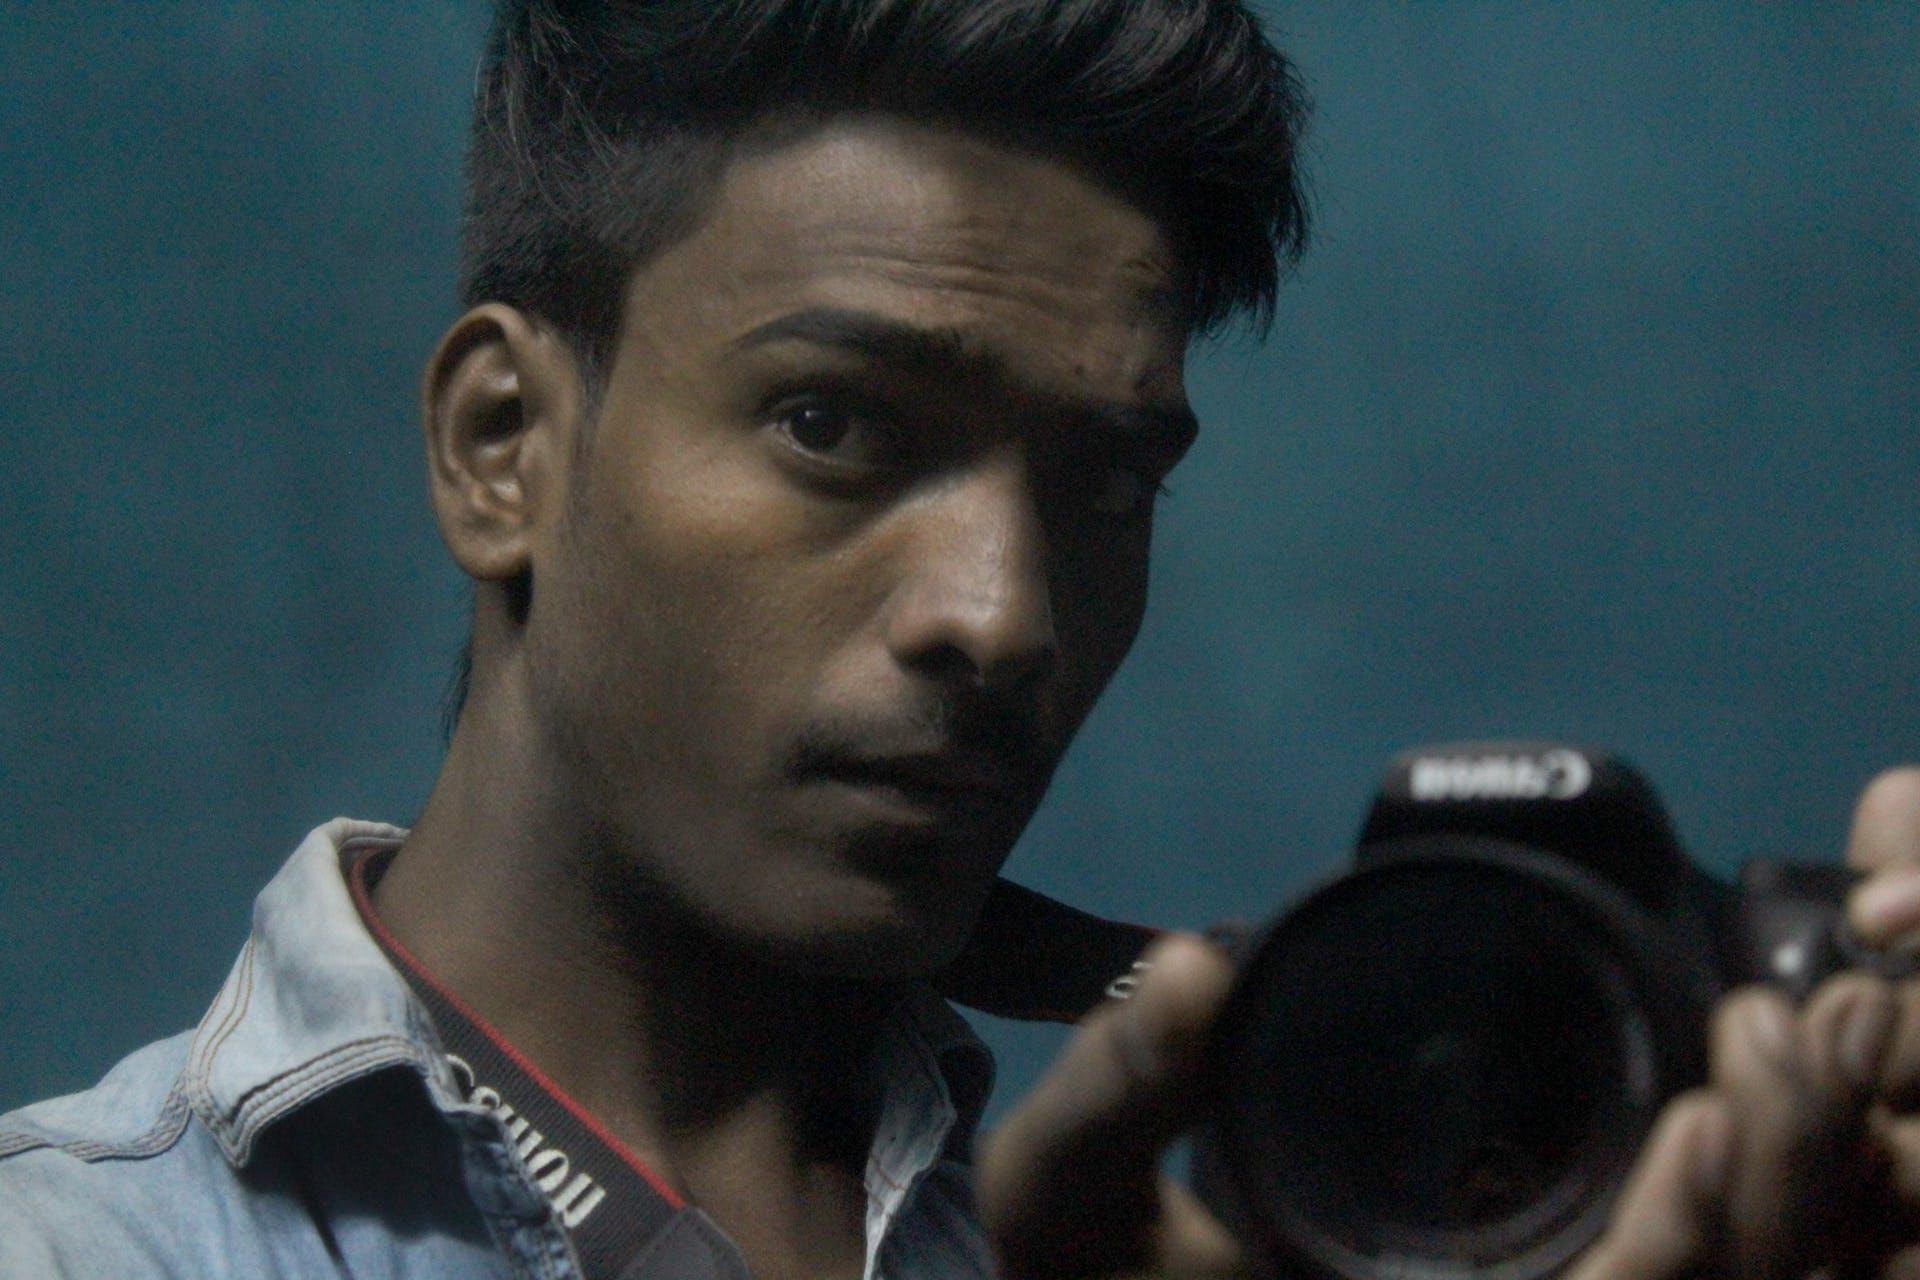 cool man creative young photography camera